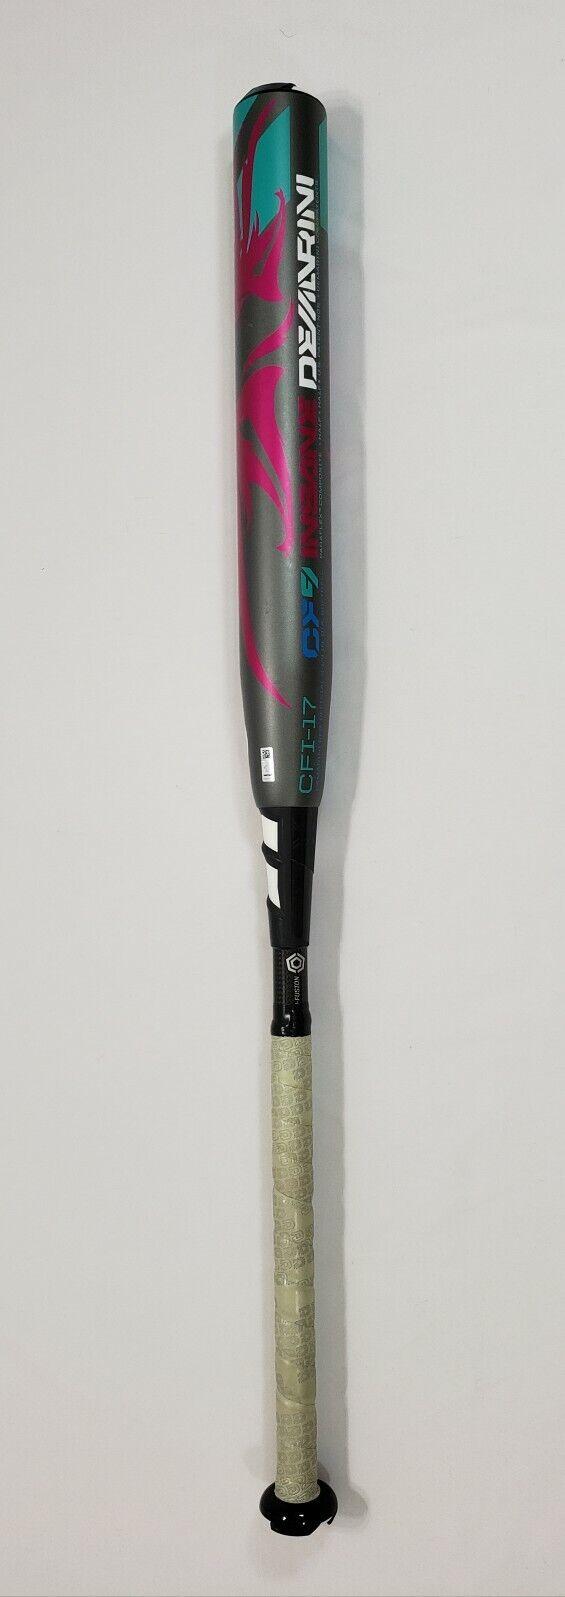 DeMarini CF9 Insane Fast Pitch Softball Bat CFI-17 33 23 (-10)